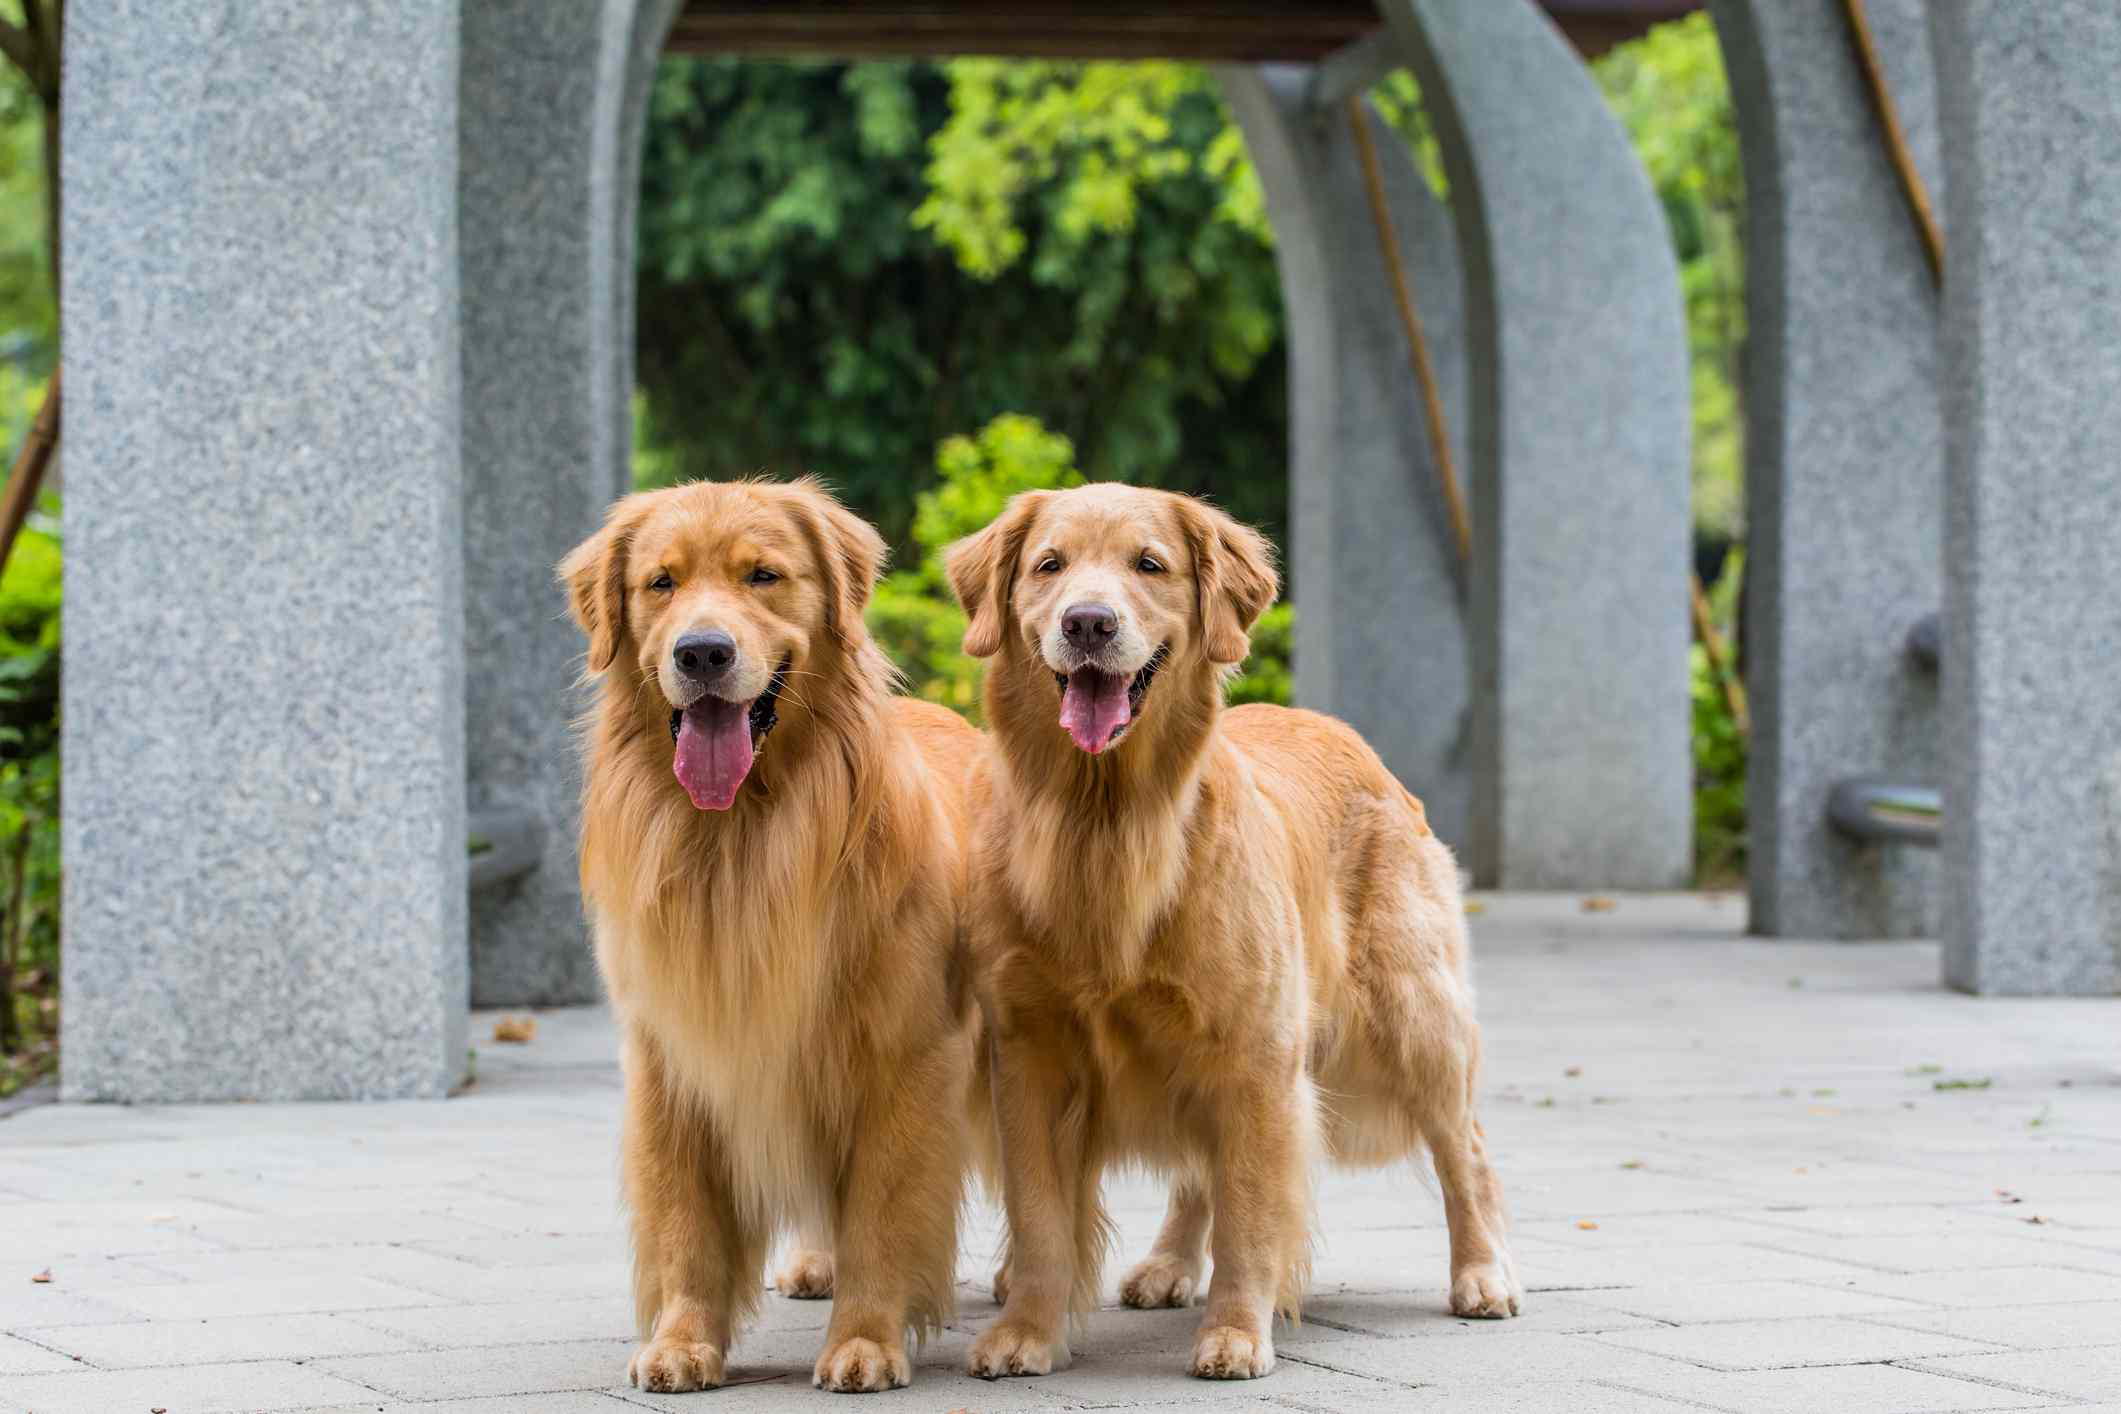 Two Golden Retrievers outdoors